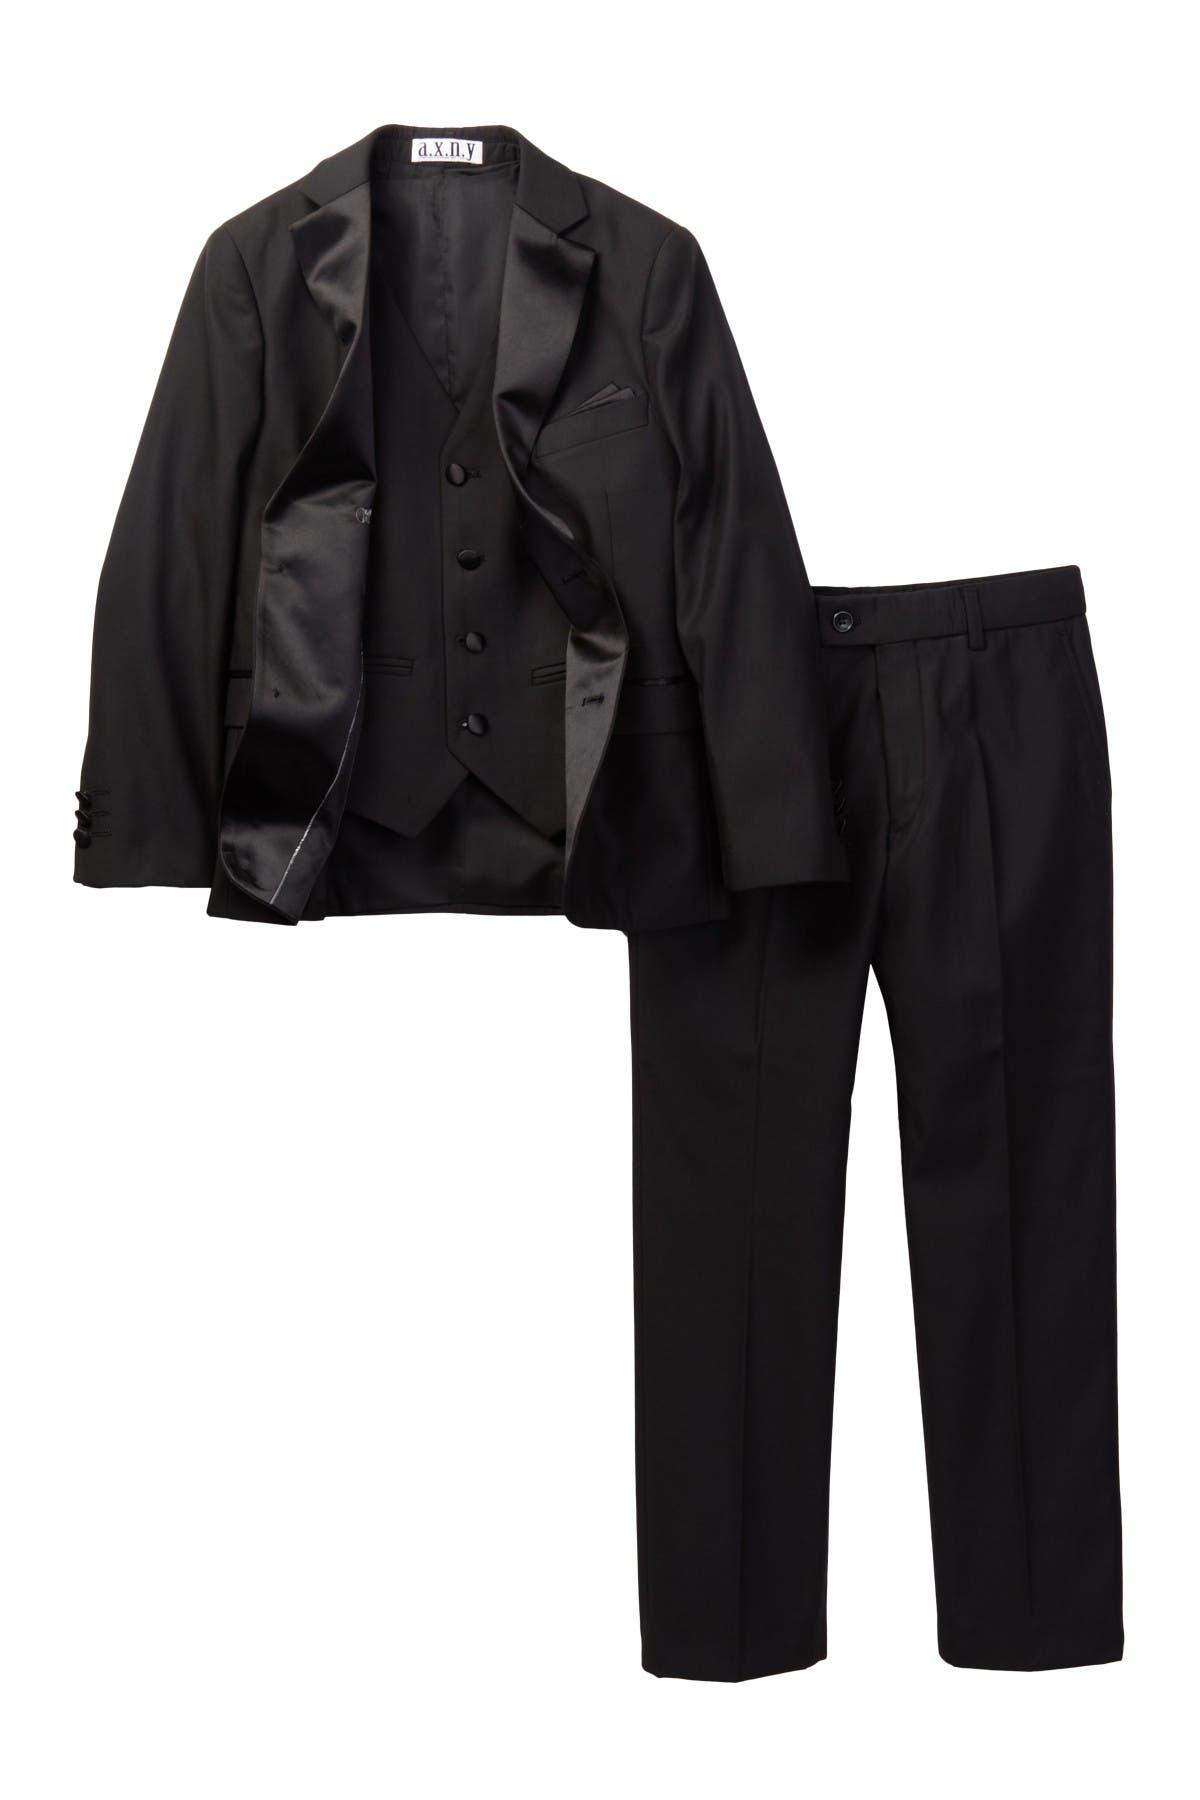 Image of Isaac Mizrahi 3 Piece Notch Lapel Tuxedo